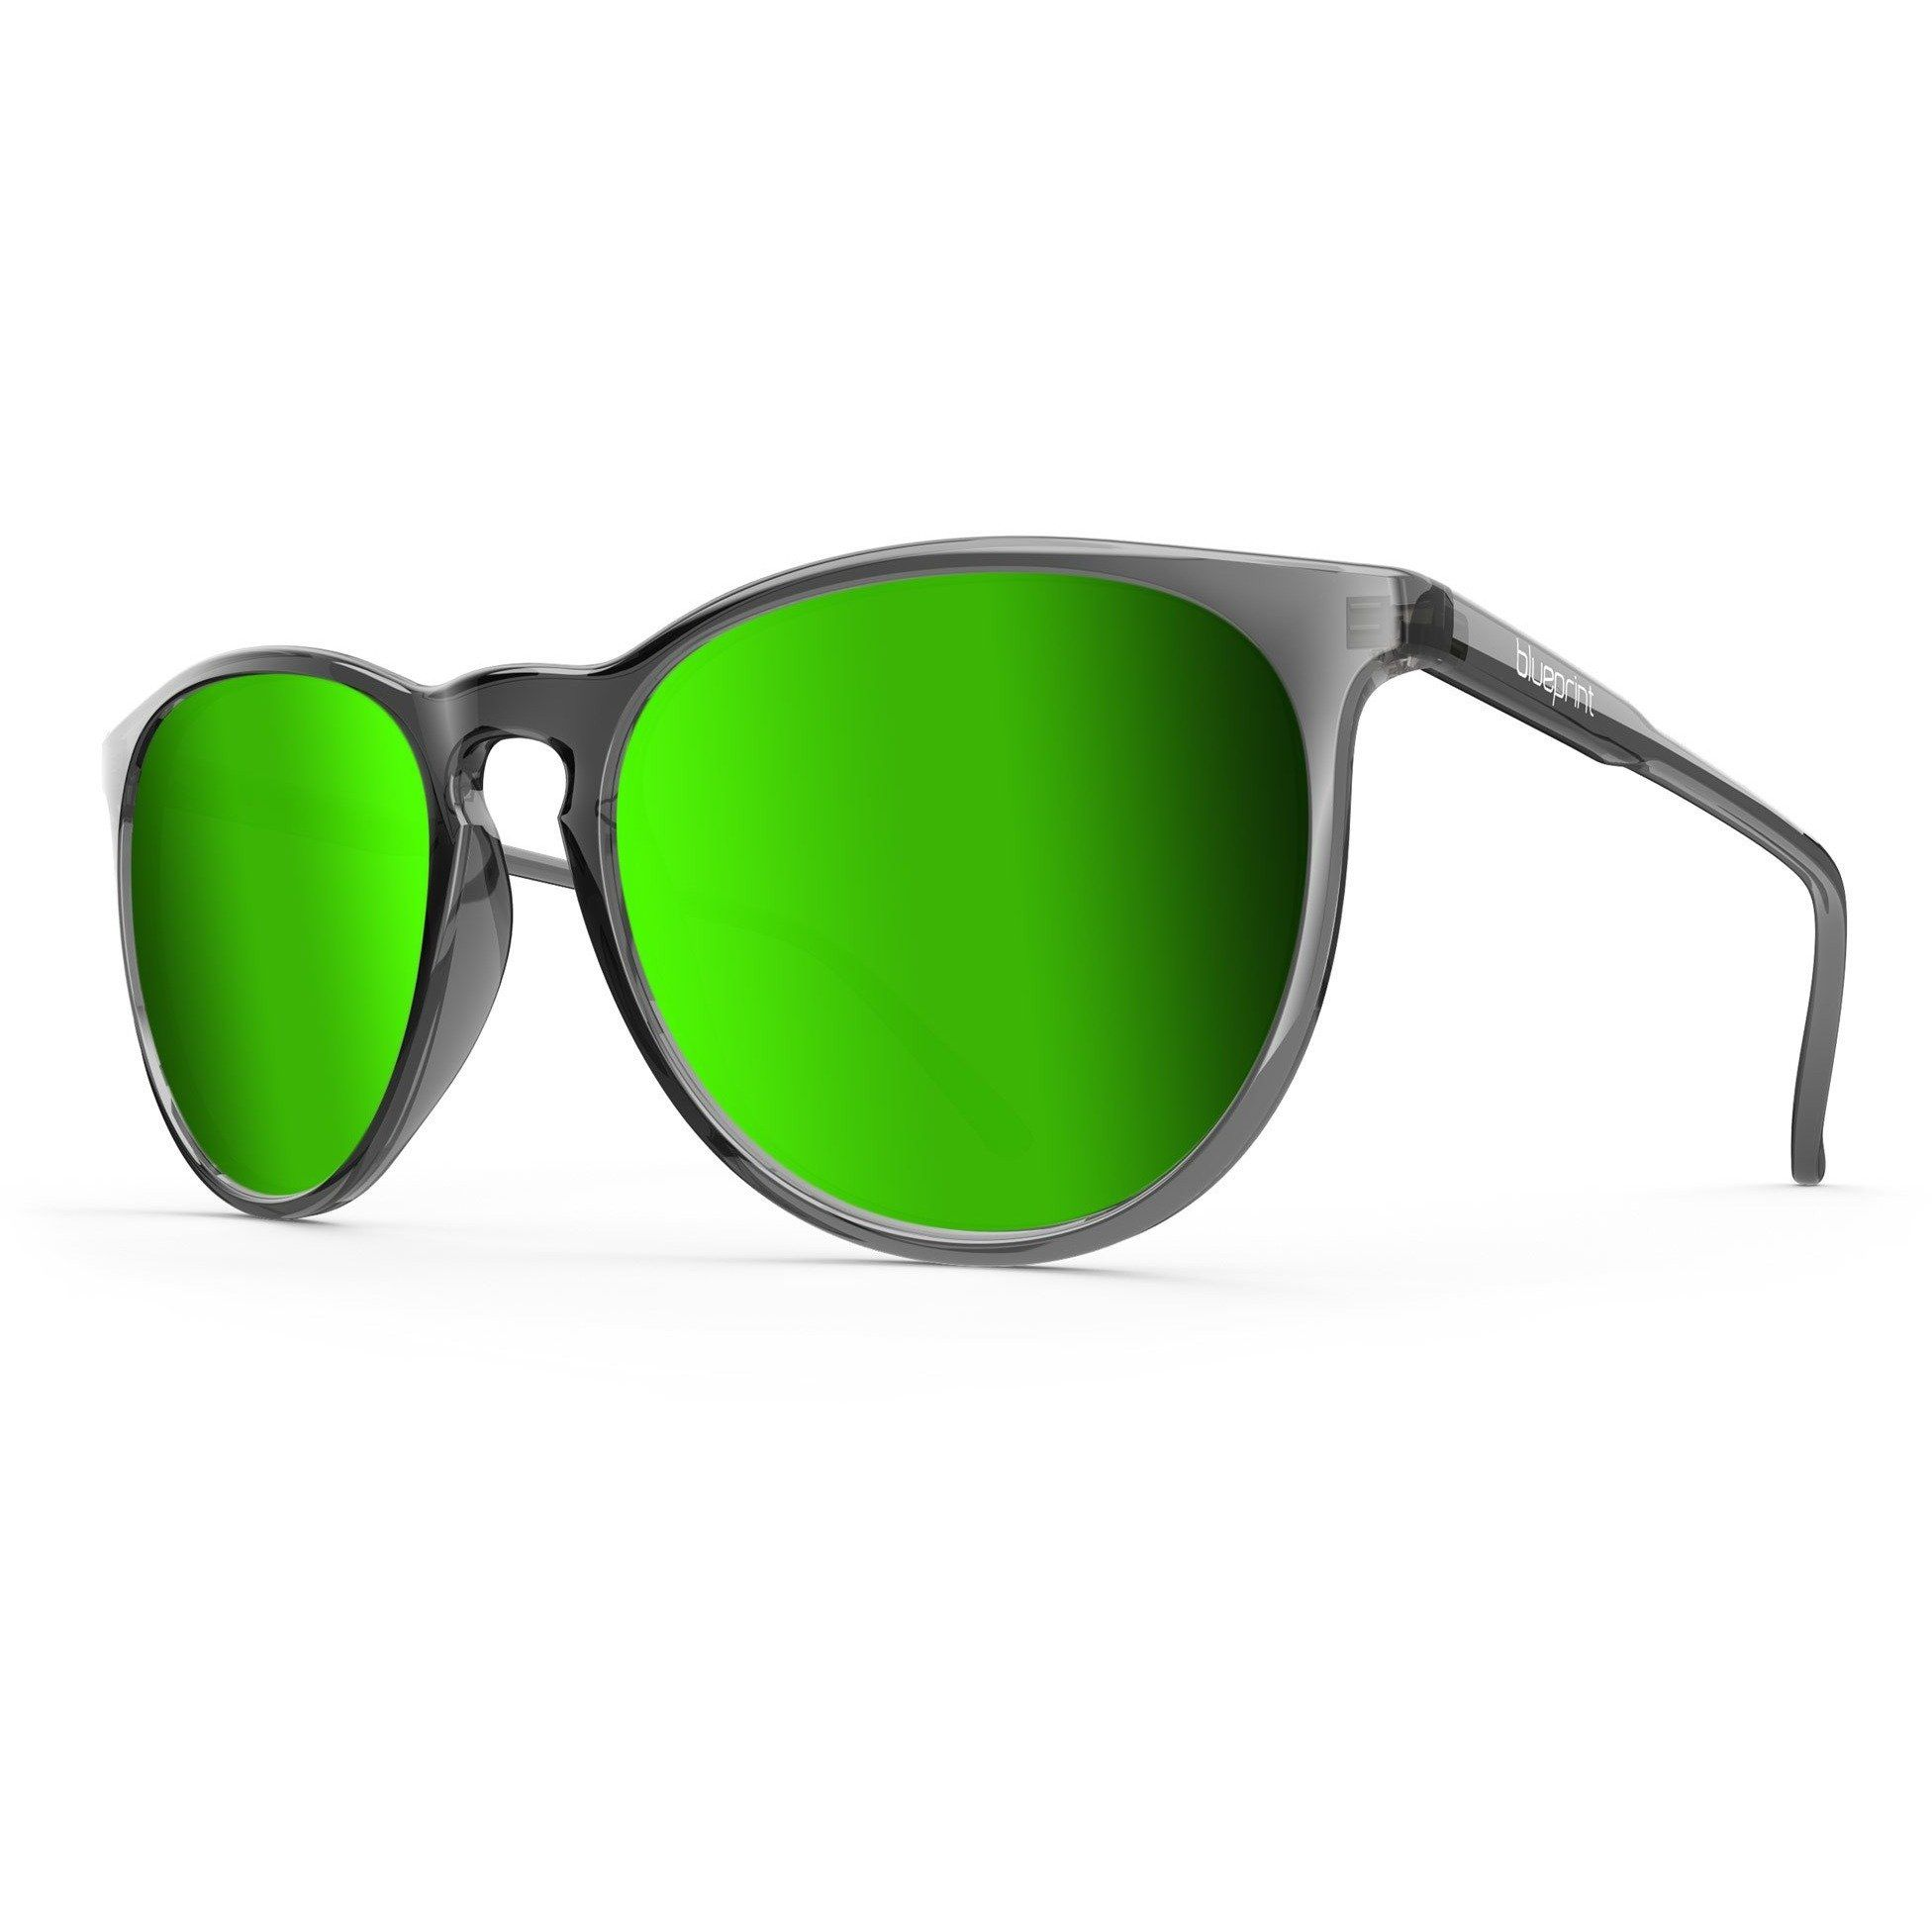 Sonnenbrille Blueprint Senna Silver Gloss Y5qtOD